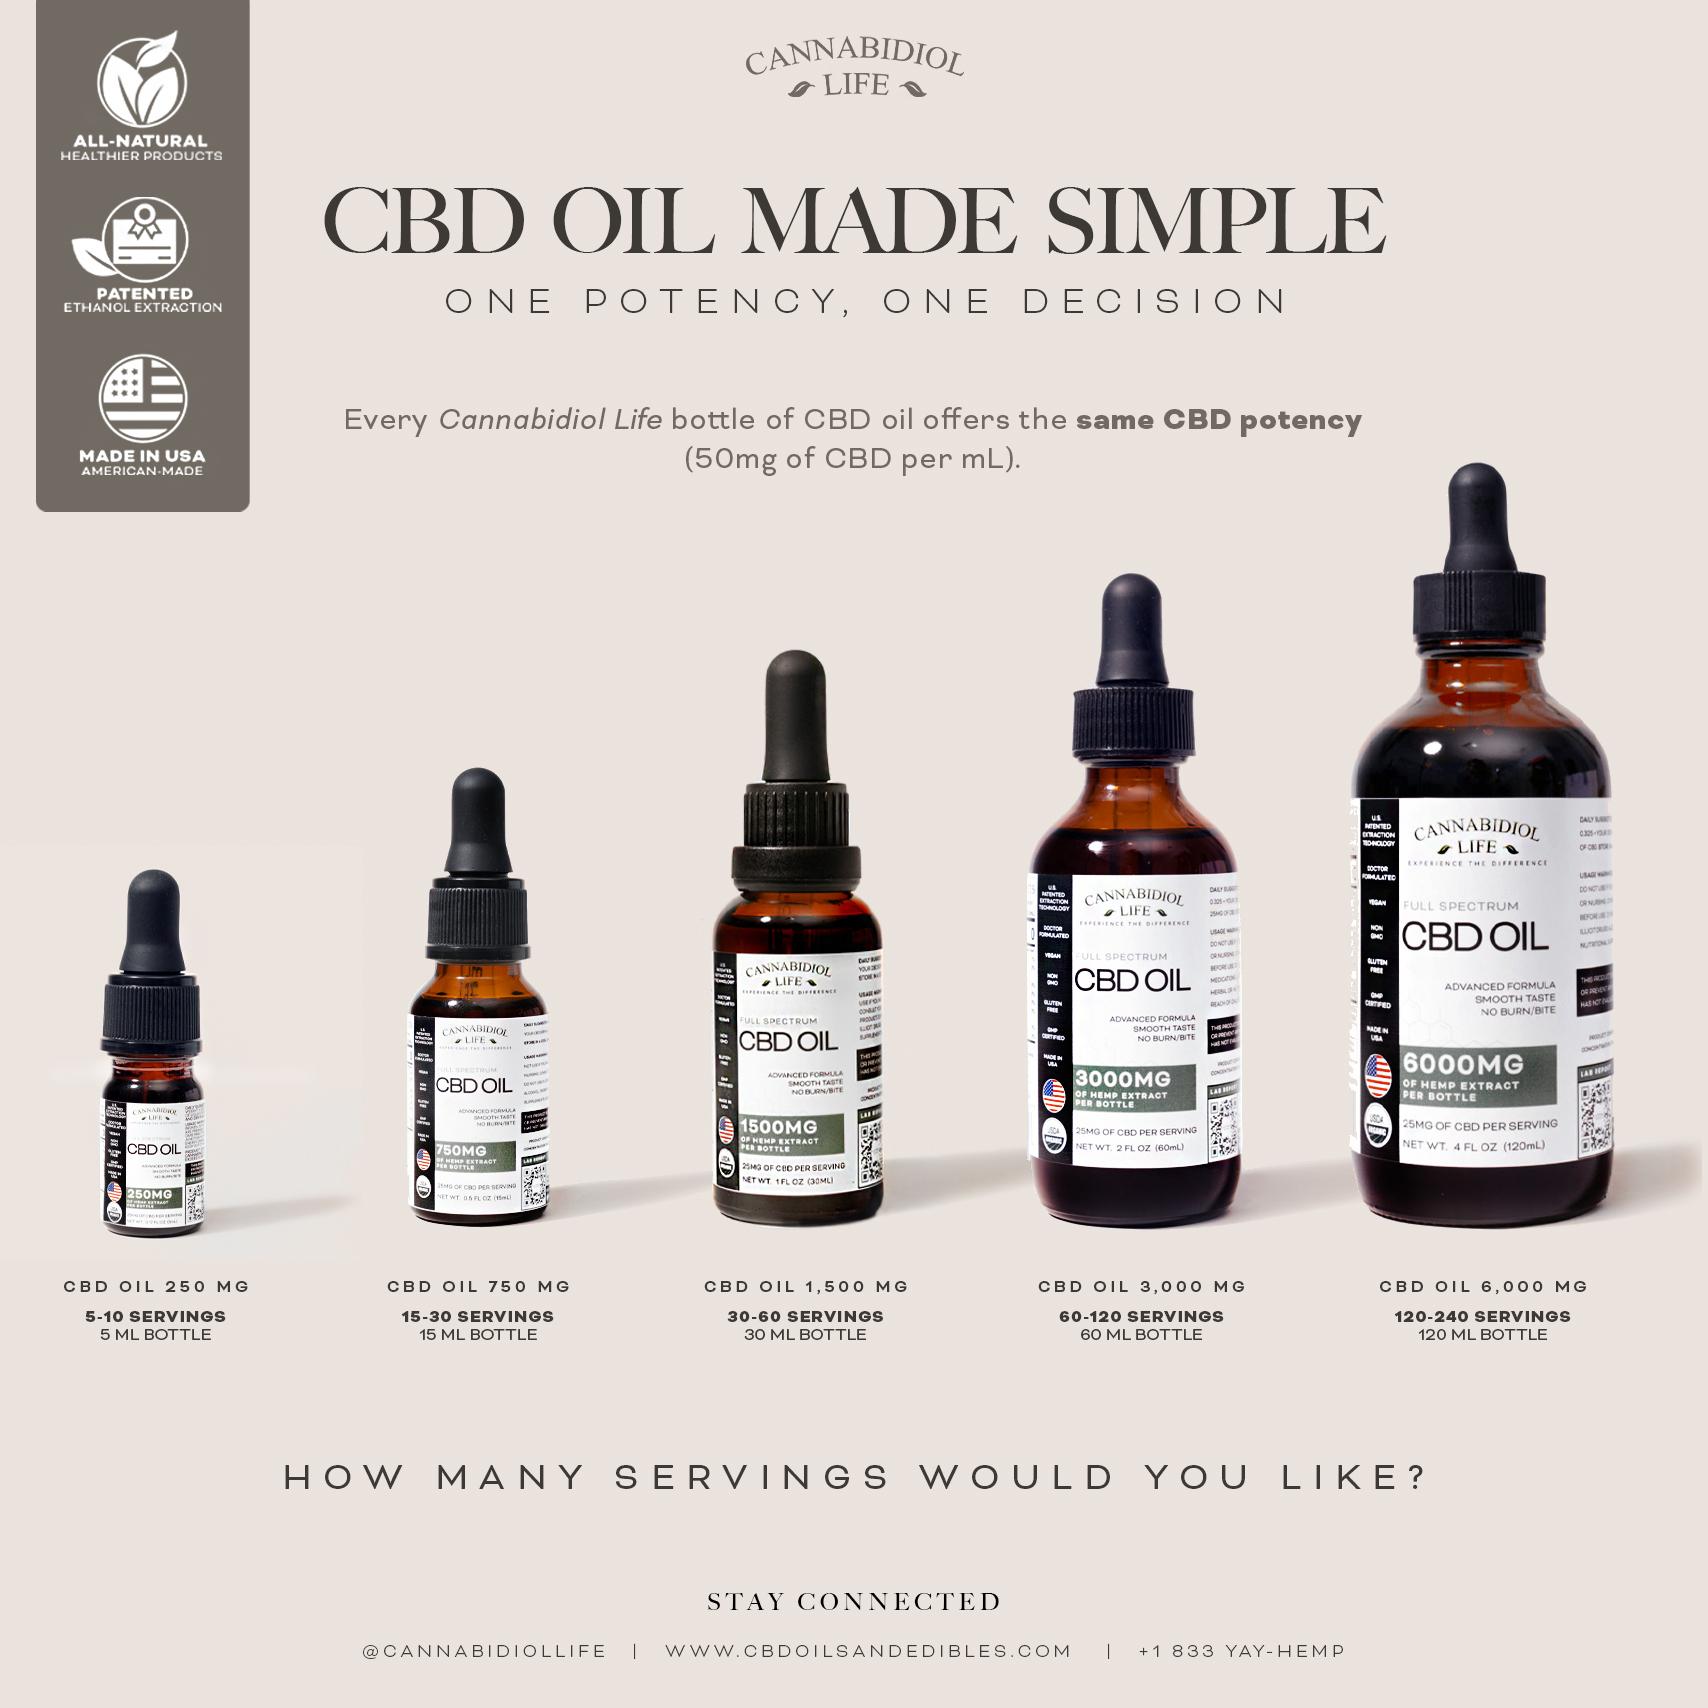 CBD dosing guide for Cannabidiol Life's High-quality CBD oil collection.